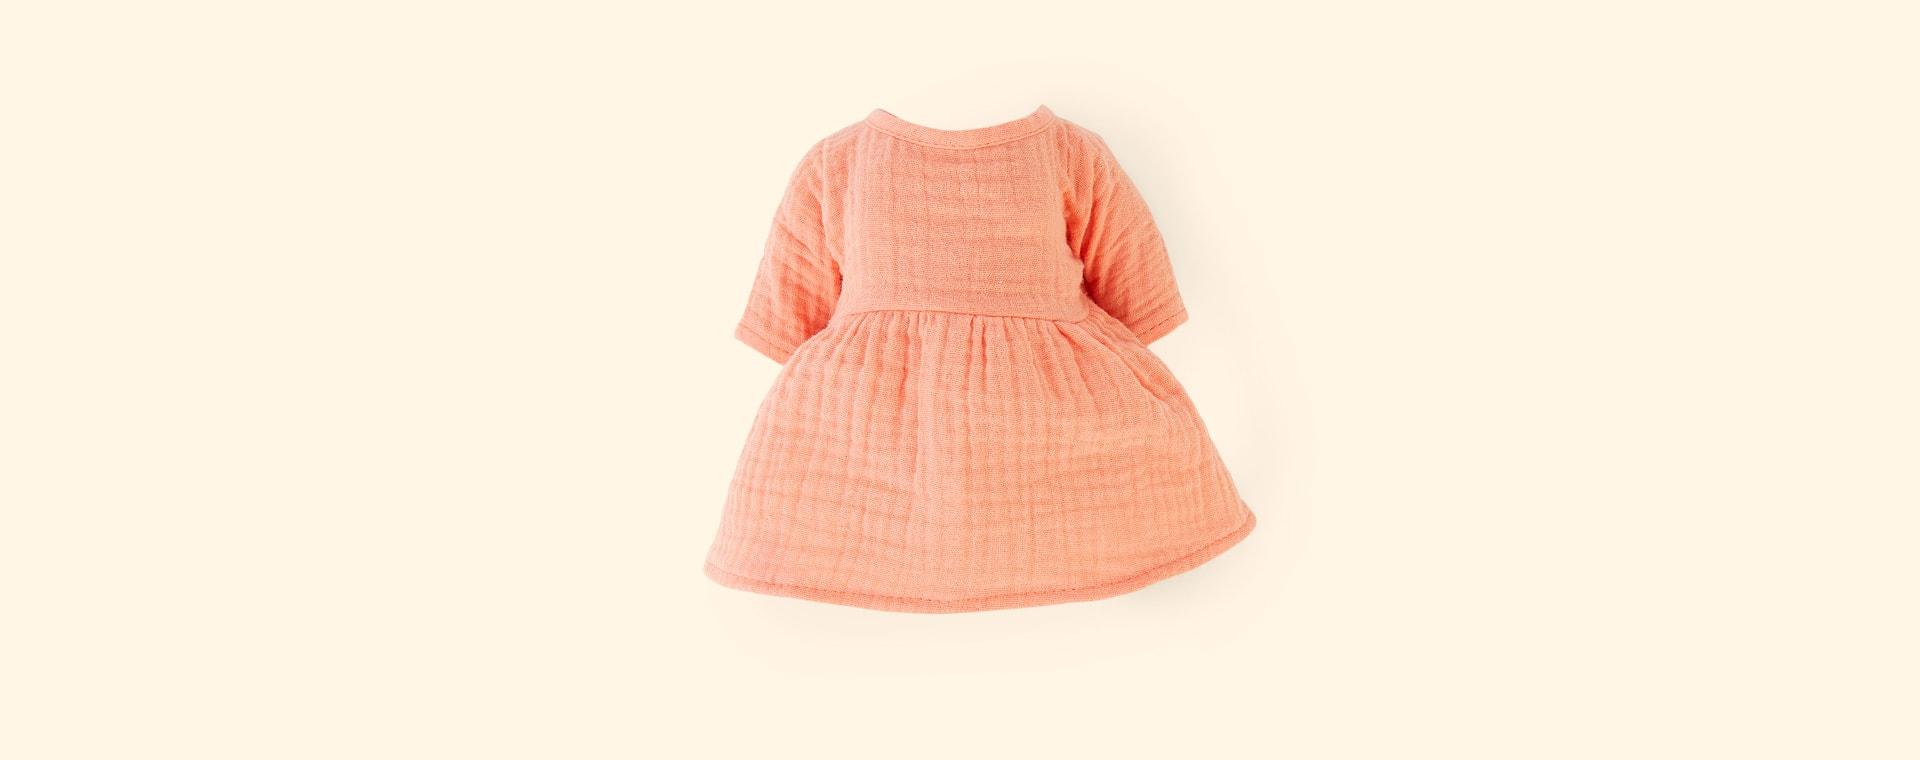 Peach Minikane Cotton Dress